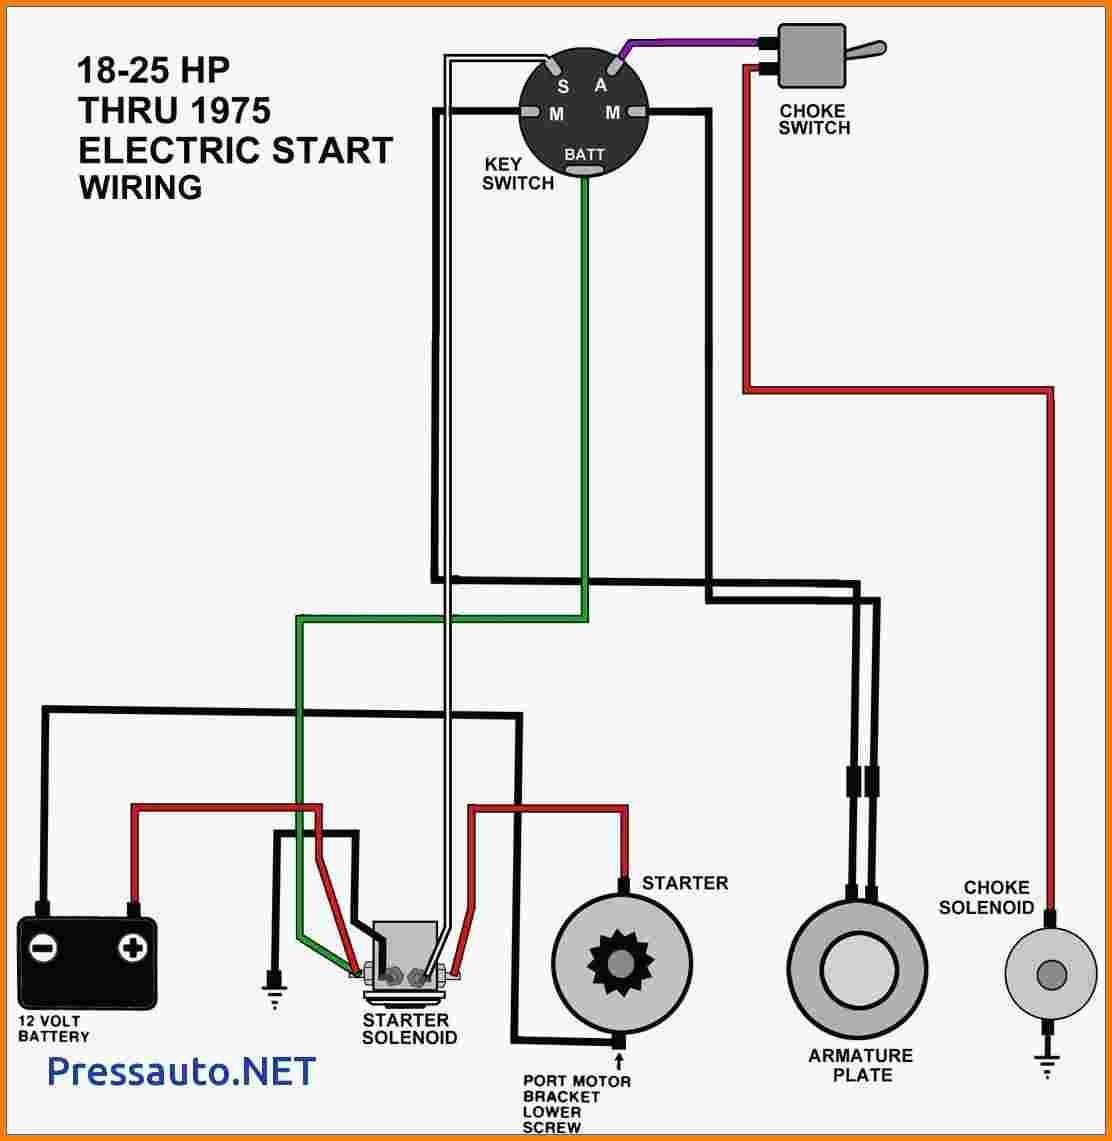 Ignition Kill Switch Wiring Diagram - Wiring Diagram K8 on